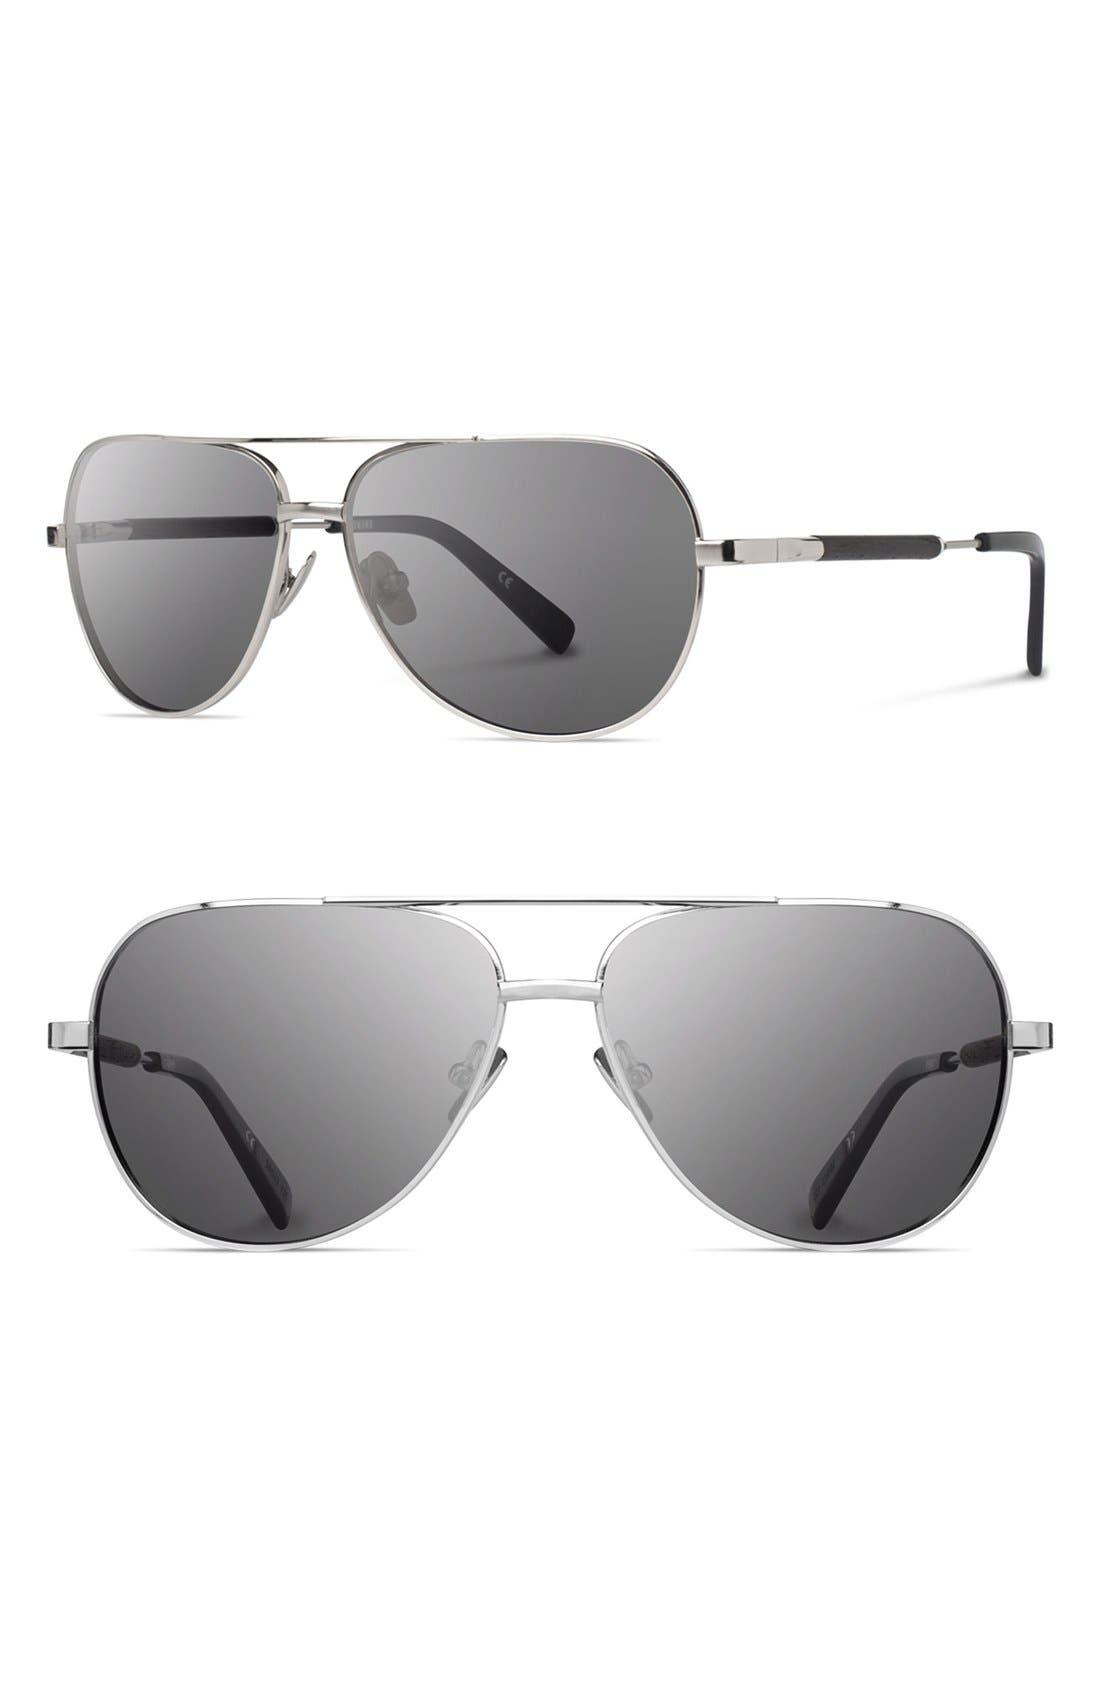 SHWOOD 'Redmond' 53mm Titanium & Wood Aviator Sunglasses